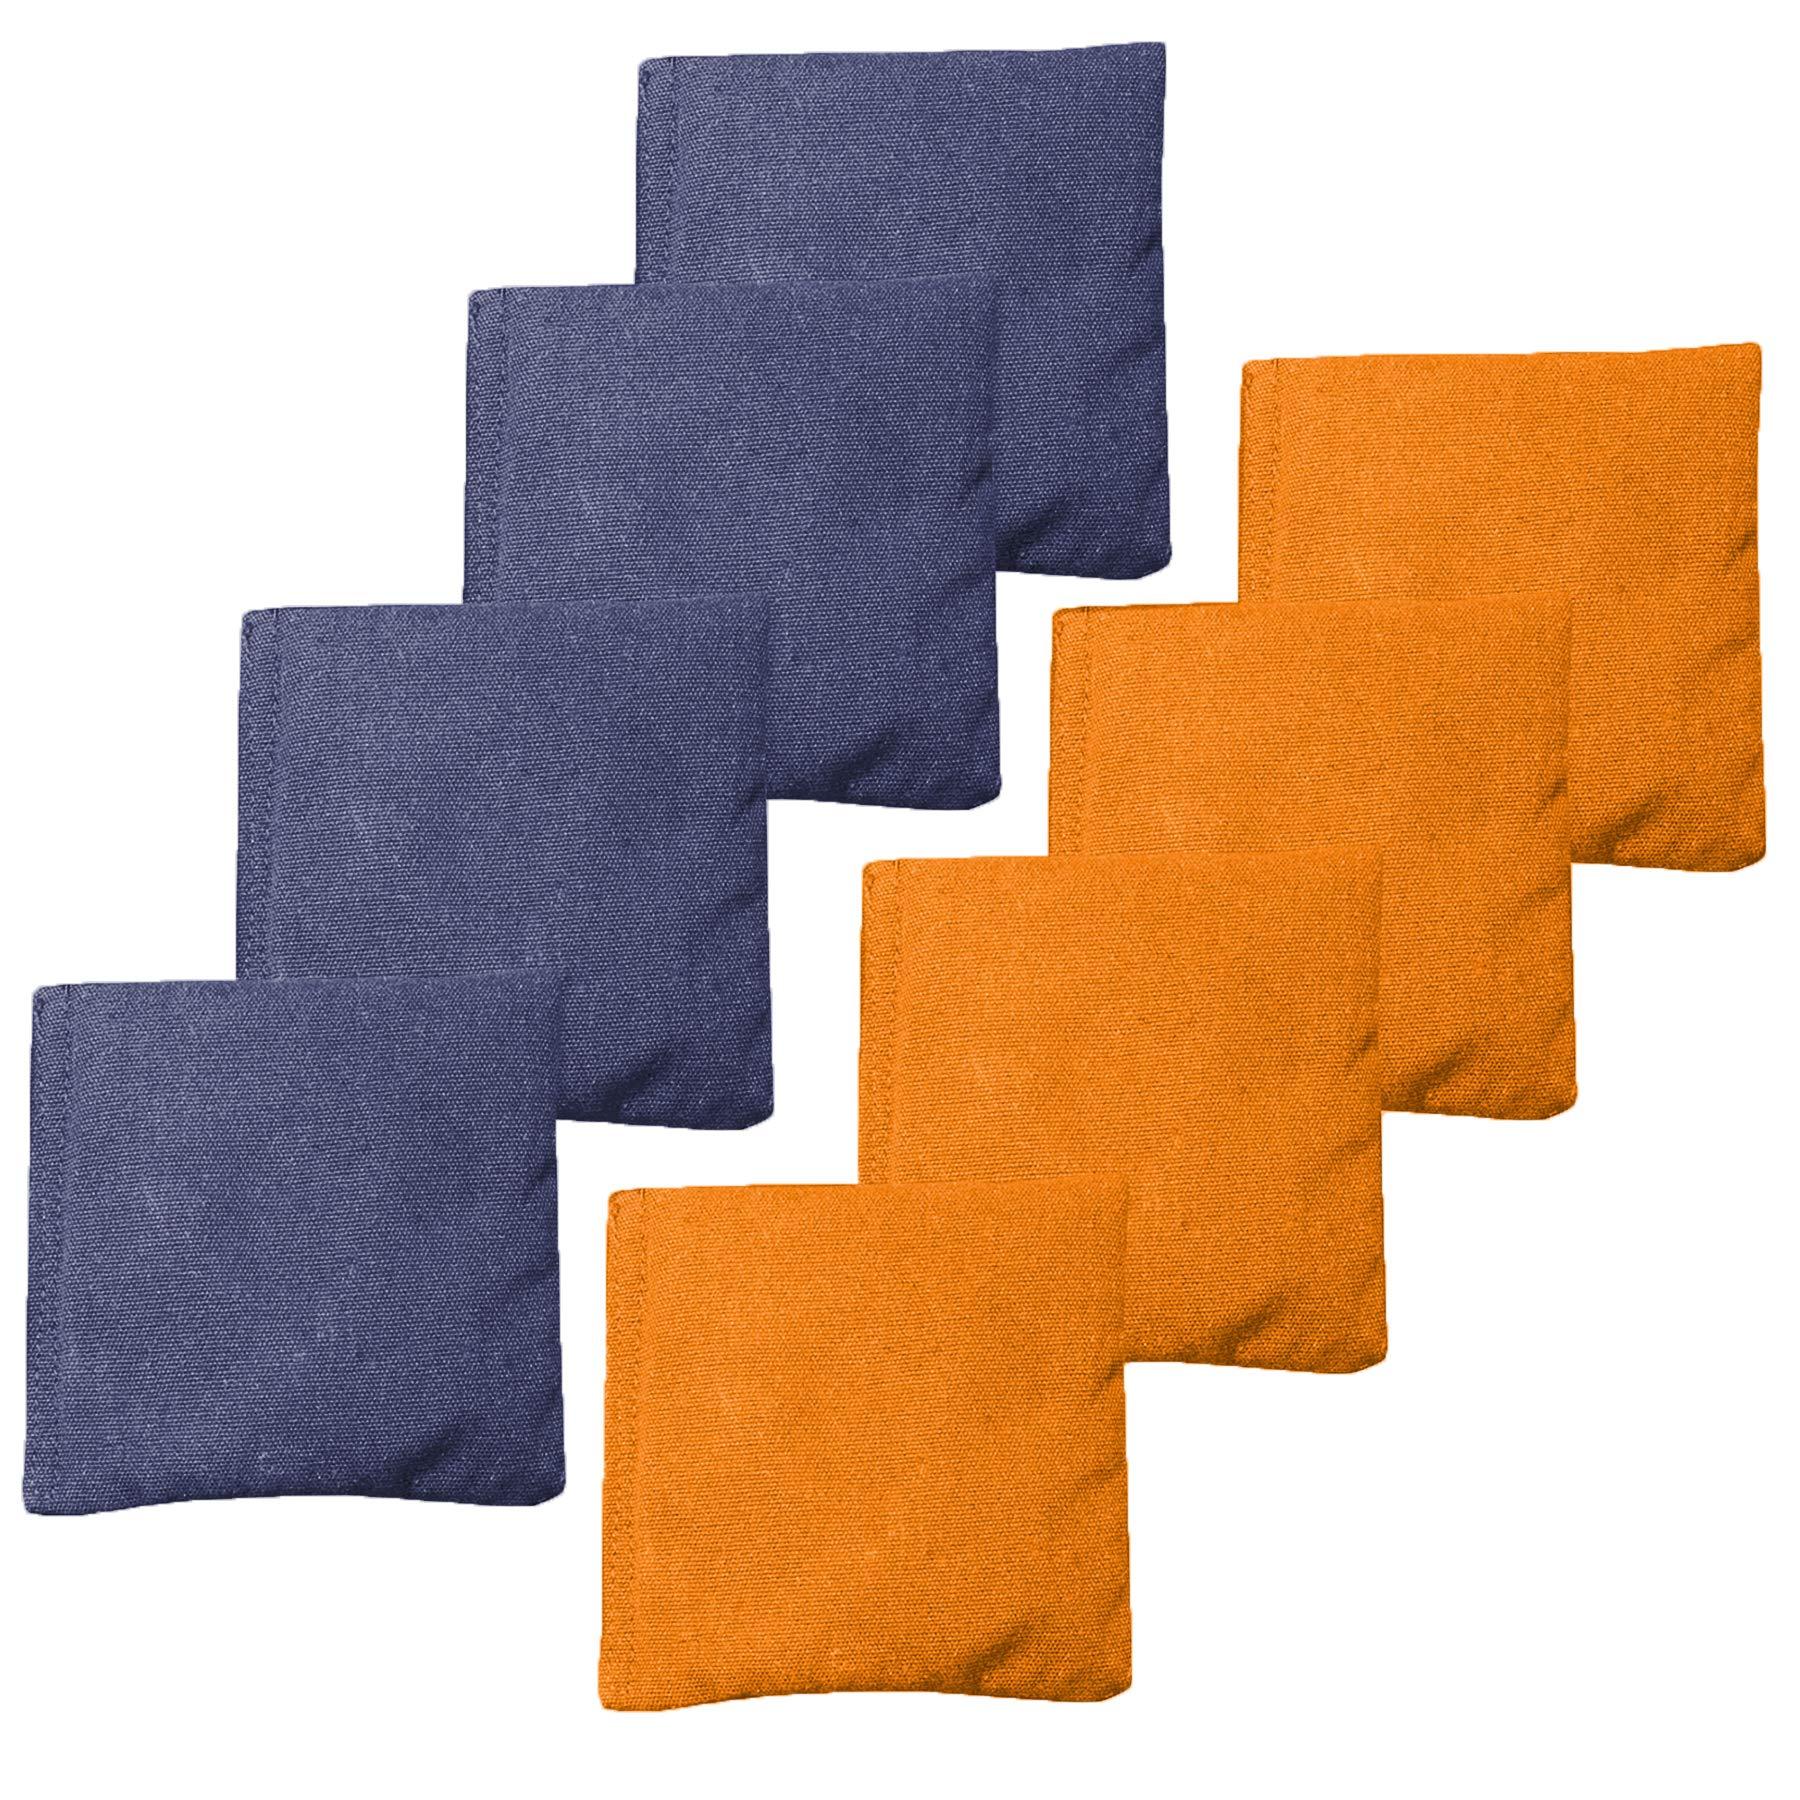 Play Platoon Weather Resistant Cornhole Bean Bags Set of 8 - Orange & Navy Blue by Play Platoon